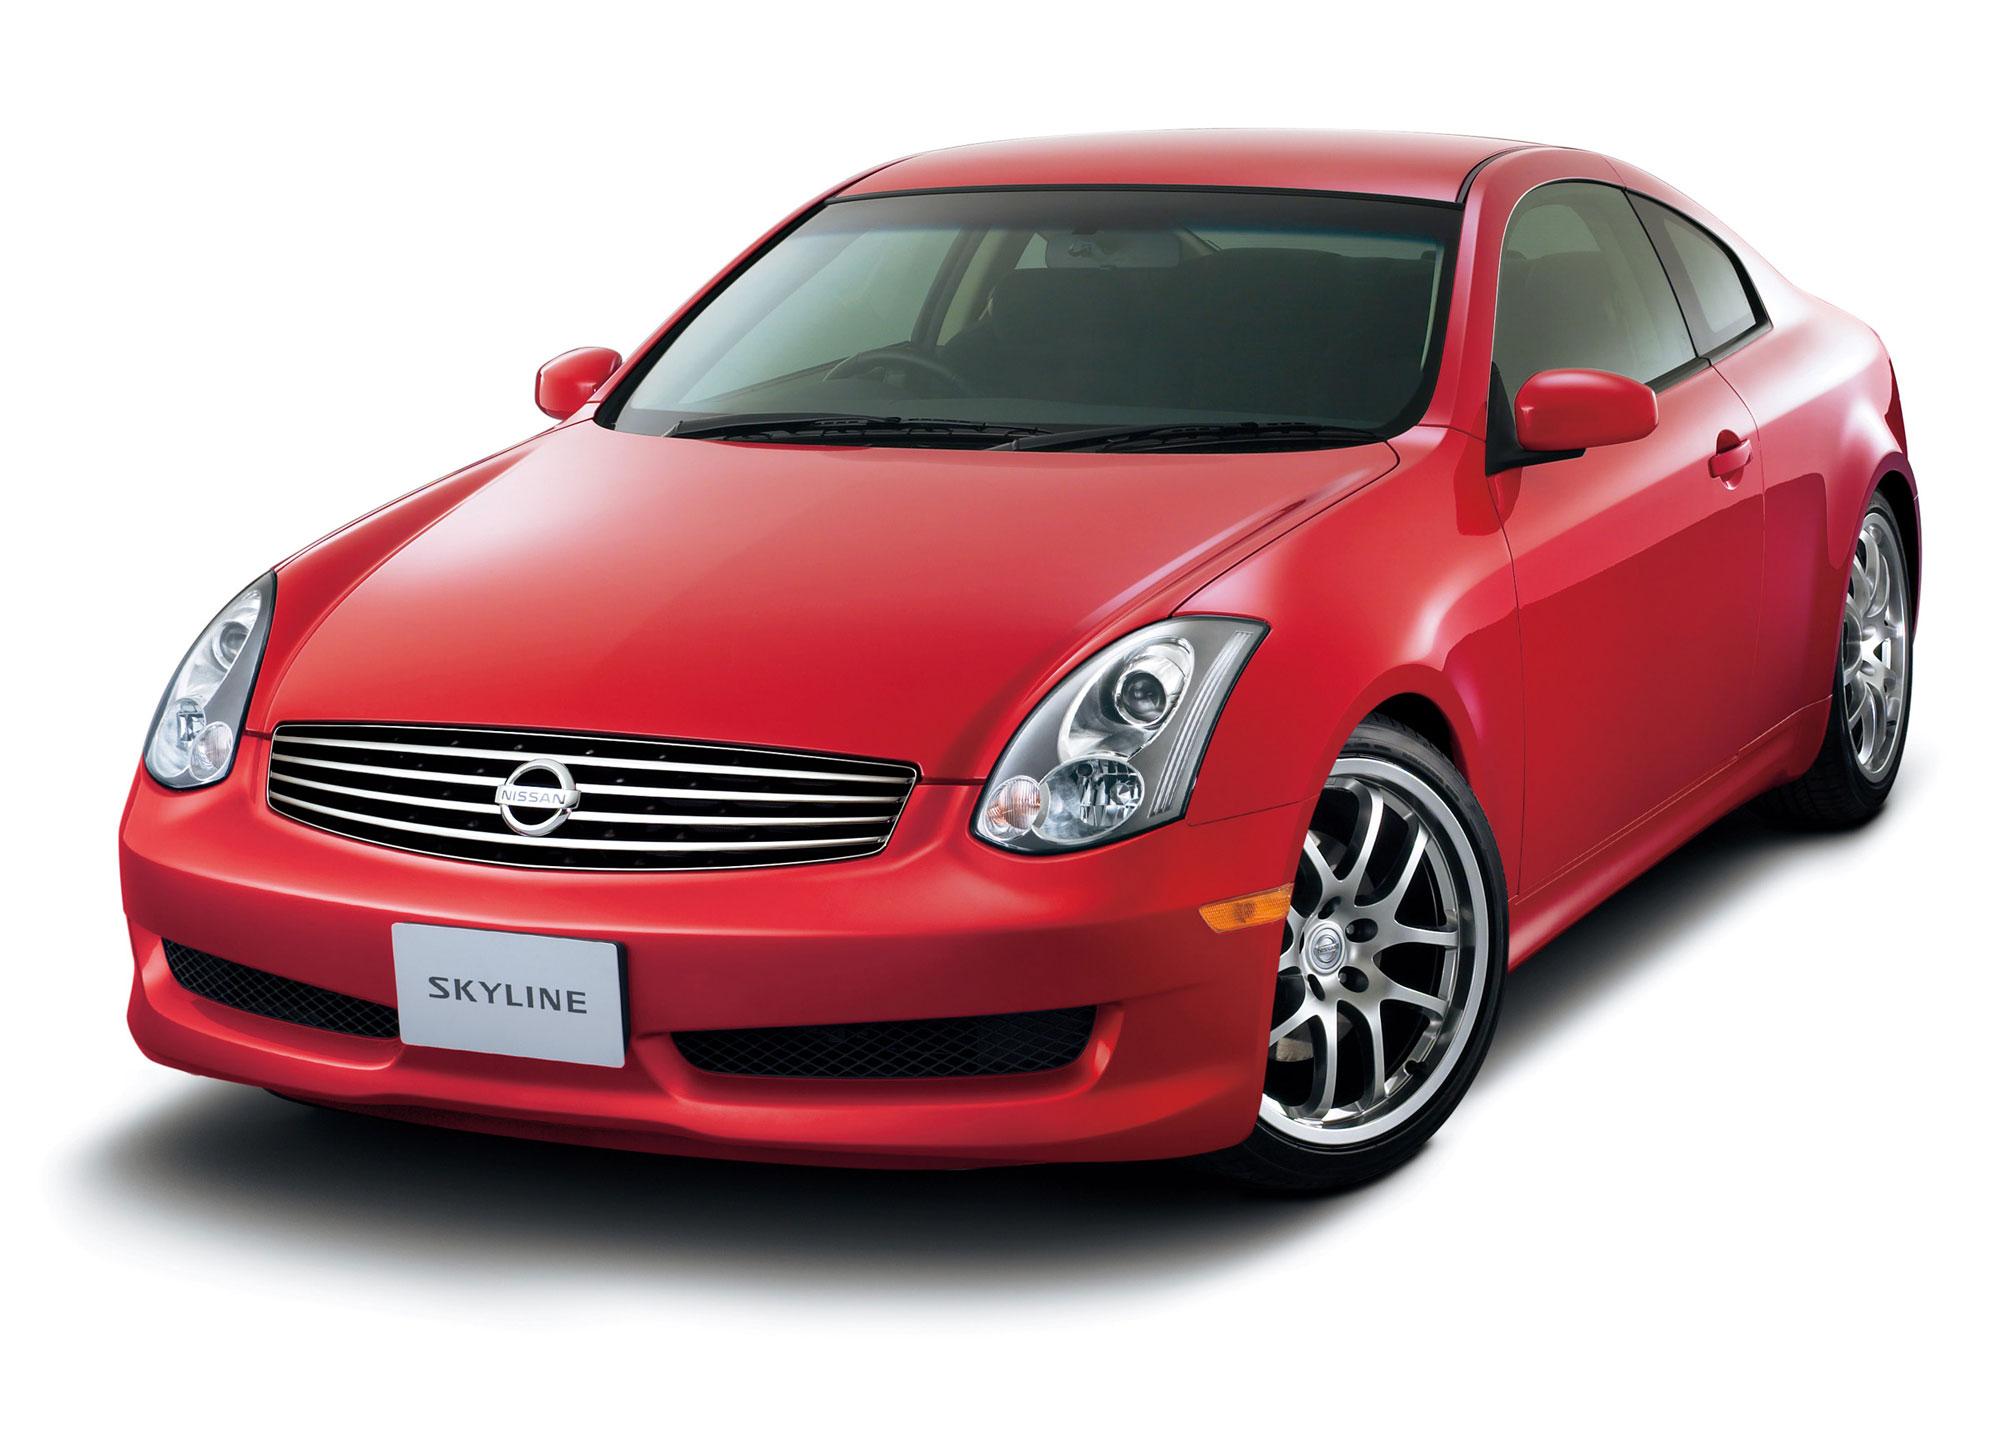 Nissan Skyline XII (V36) 2006 - 2010 Coupe #6